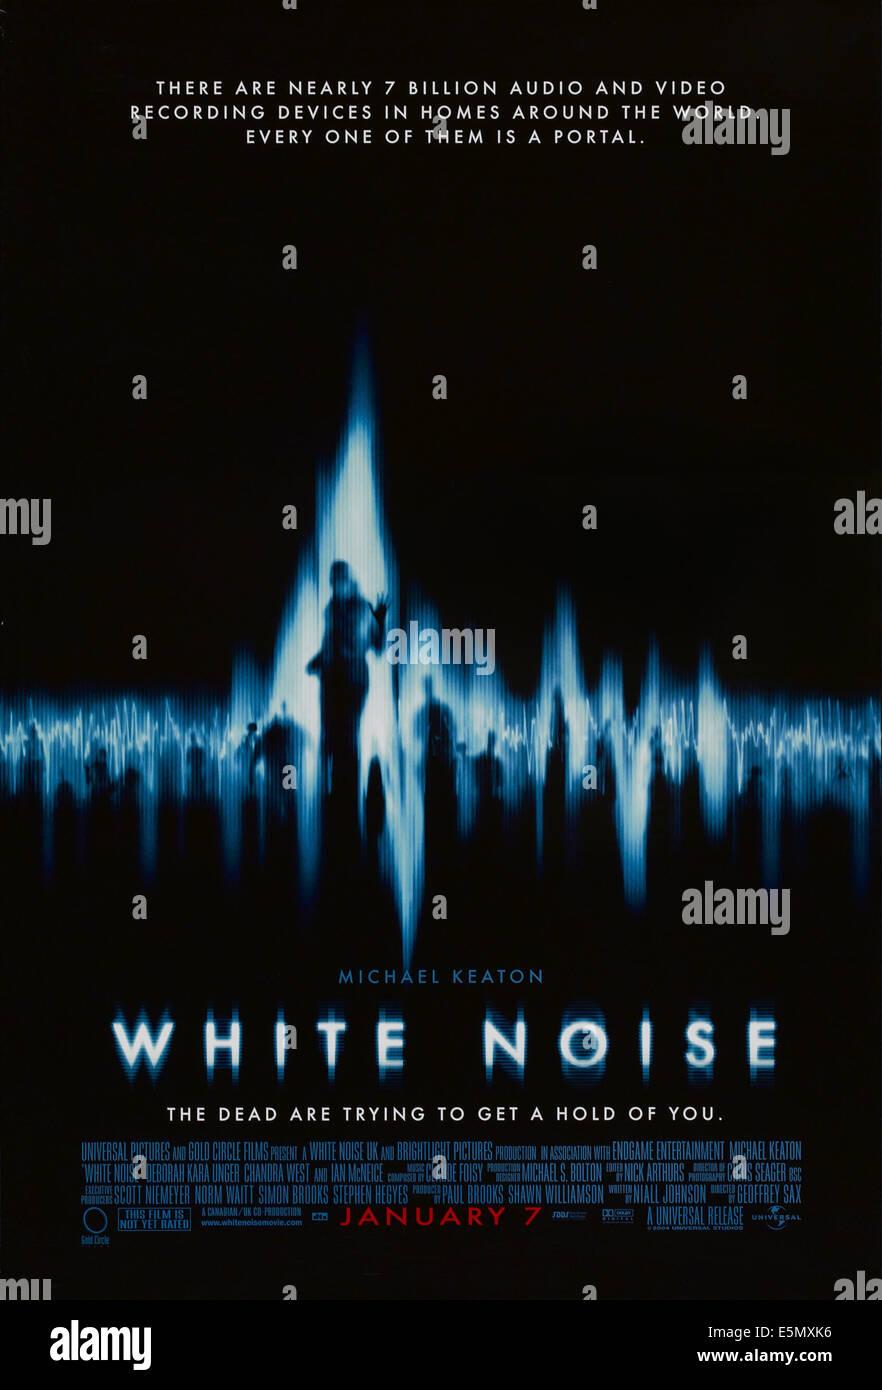 WHITE NOISE, US poster art, 2005. ©Universal/courtesy Everett Collection - Stock Image